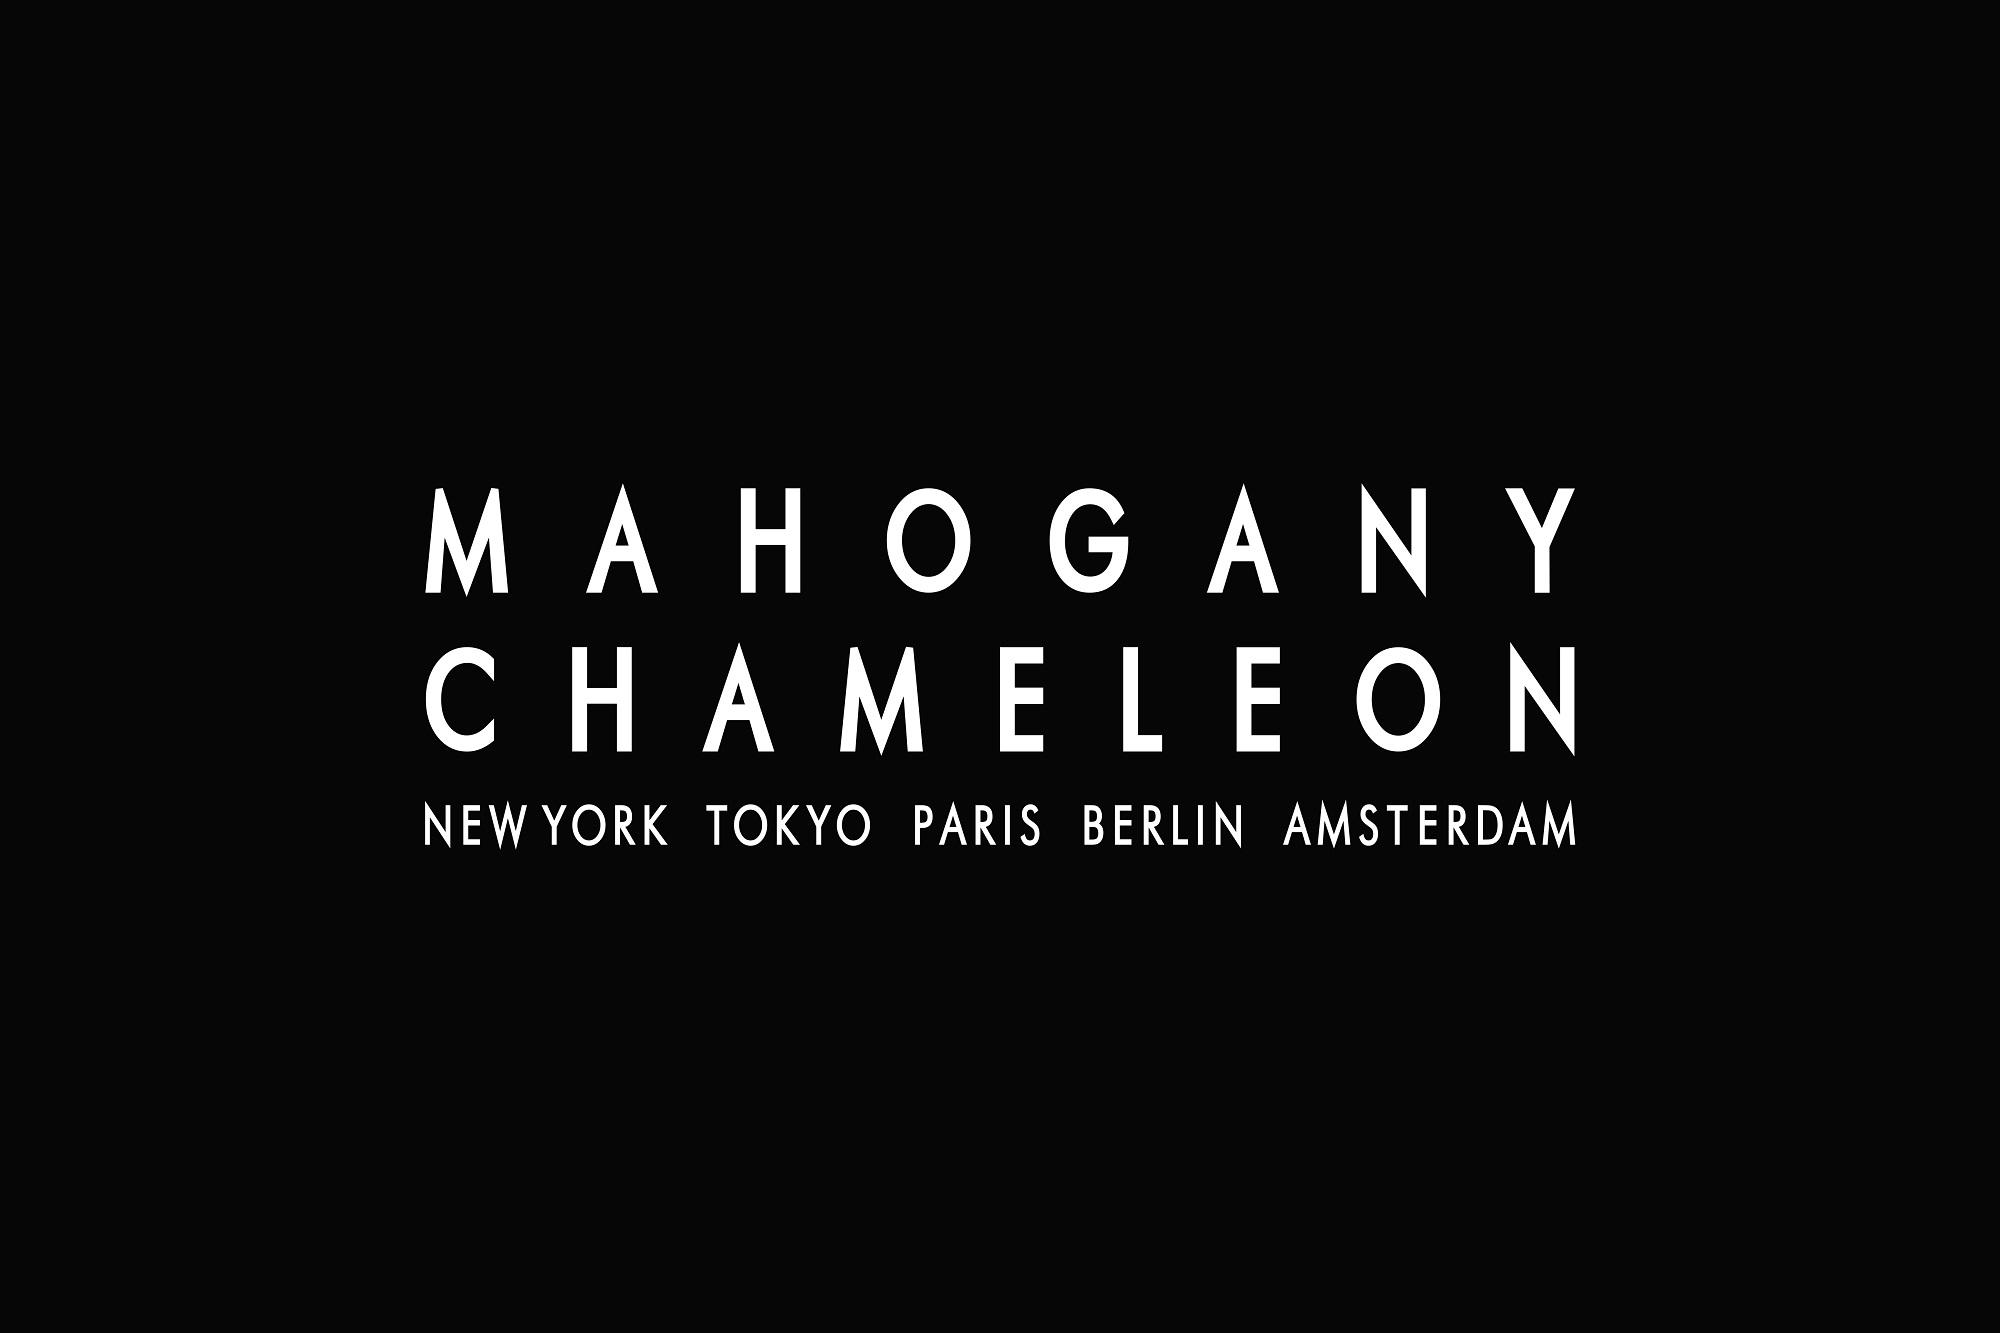 MahoganyChameleon_TOP